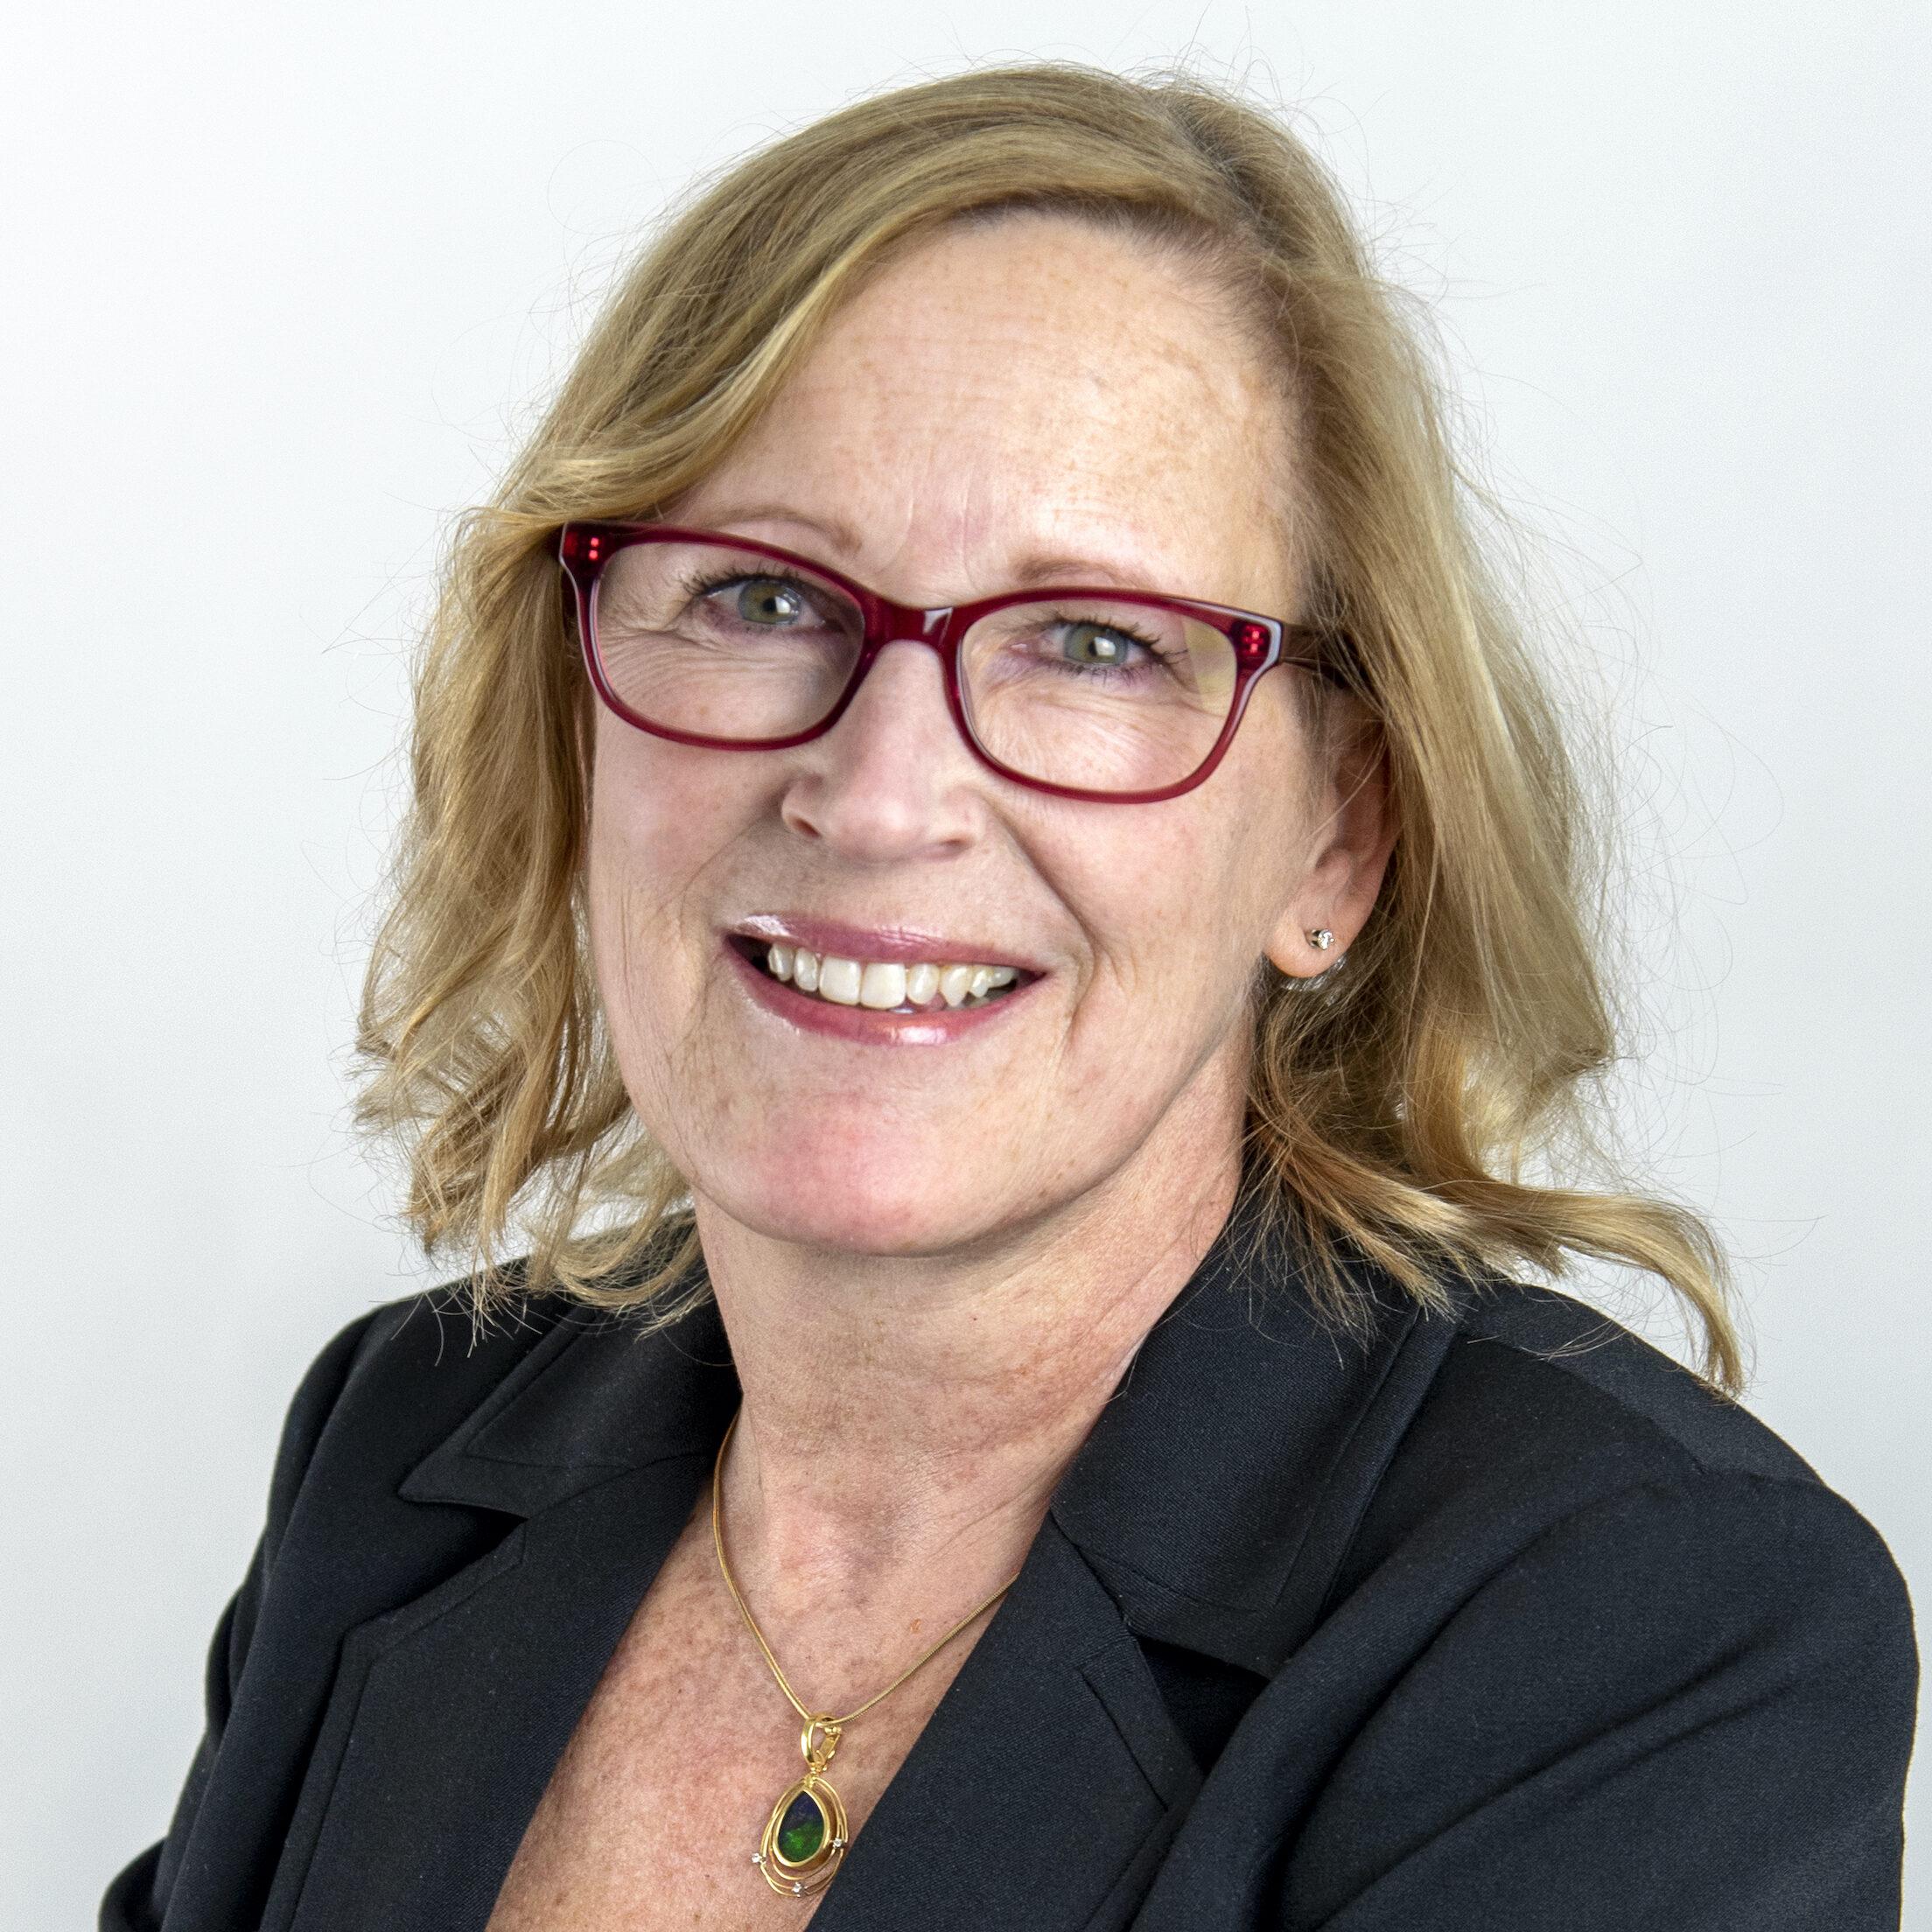 Judy Bigelow, Admin Extraordinaire, Pitts Leadership Consulting LLC